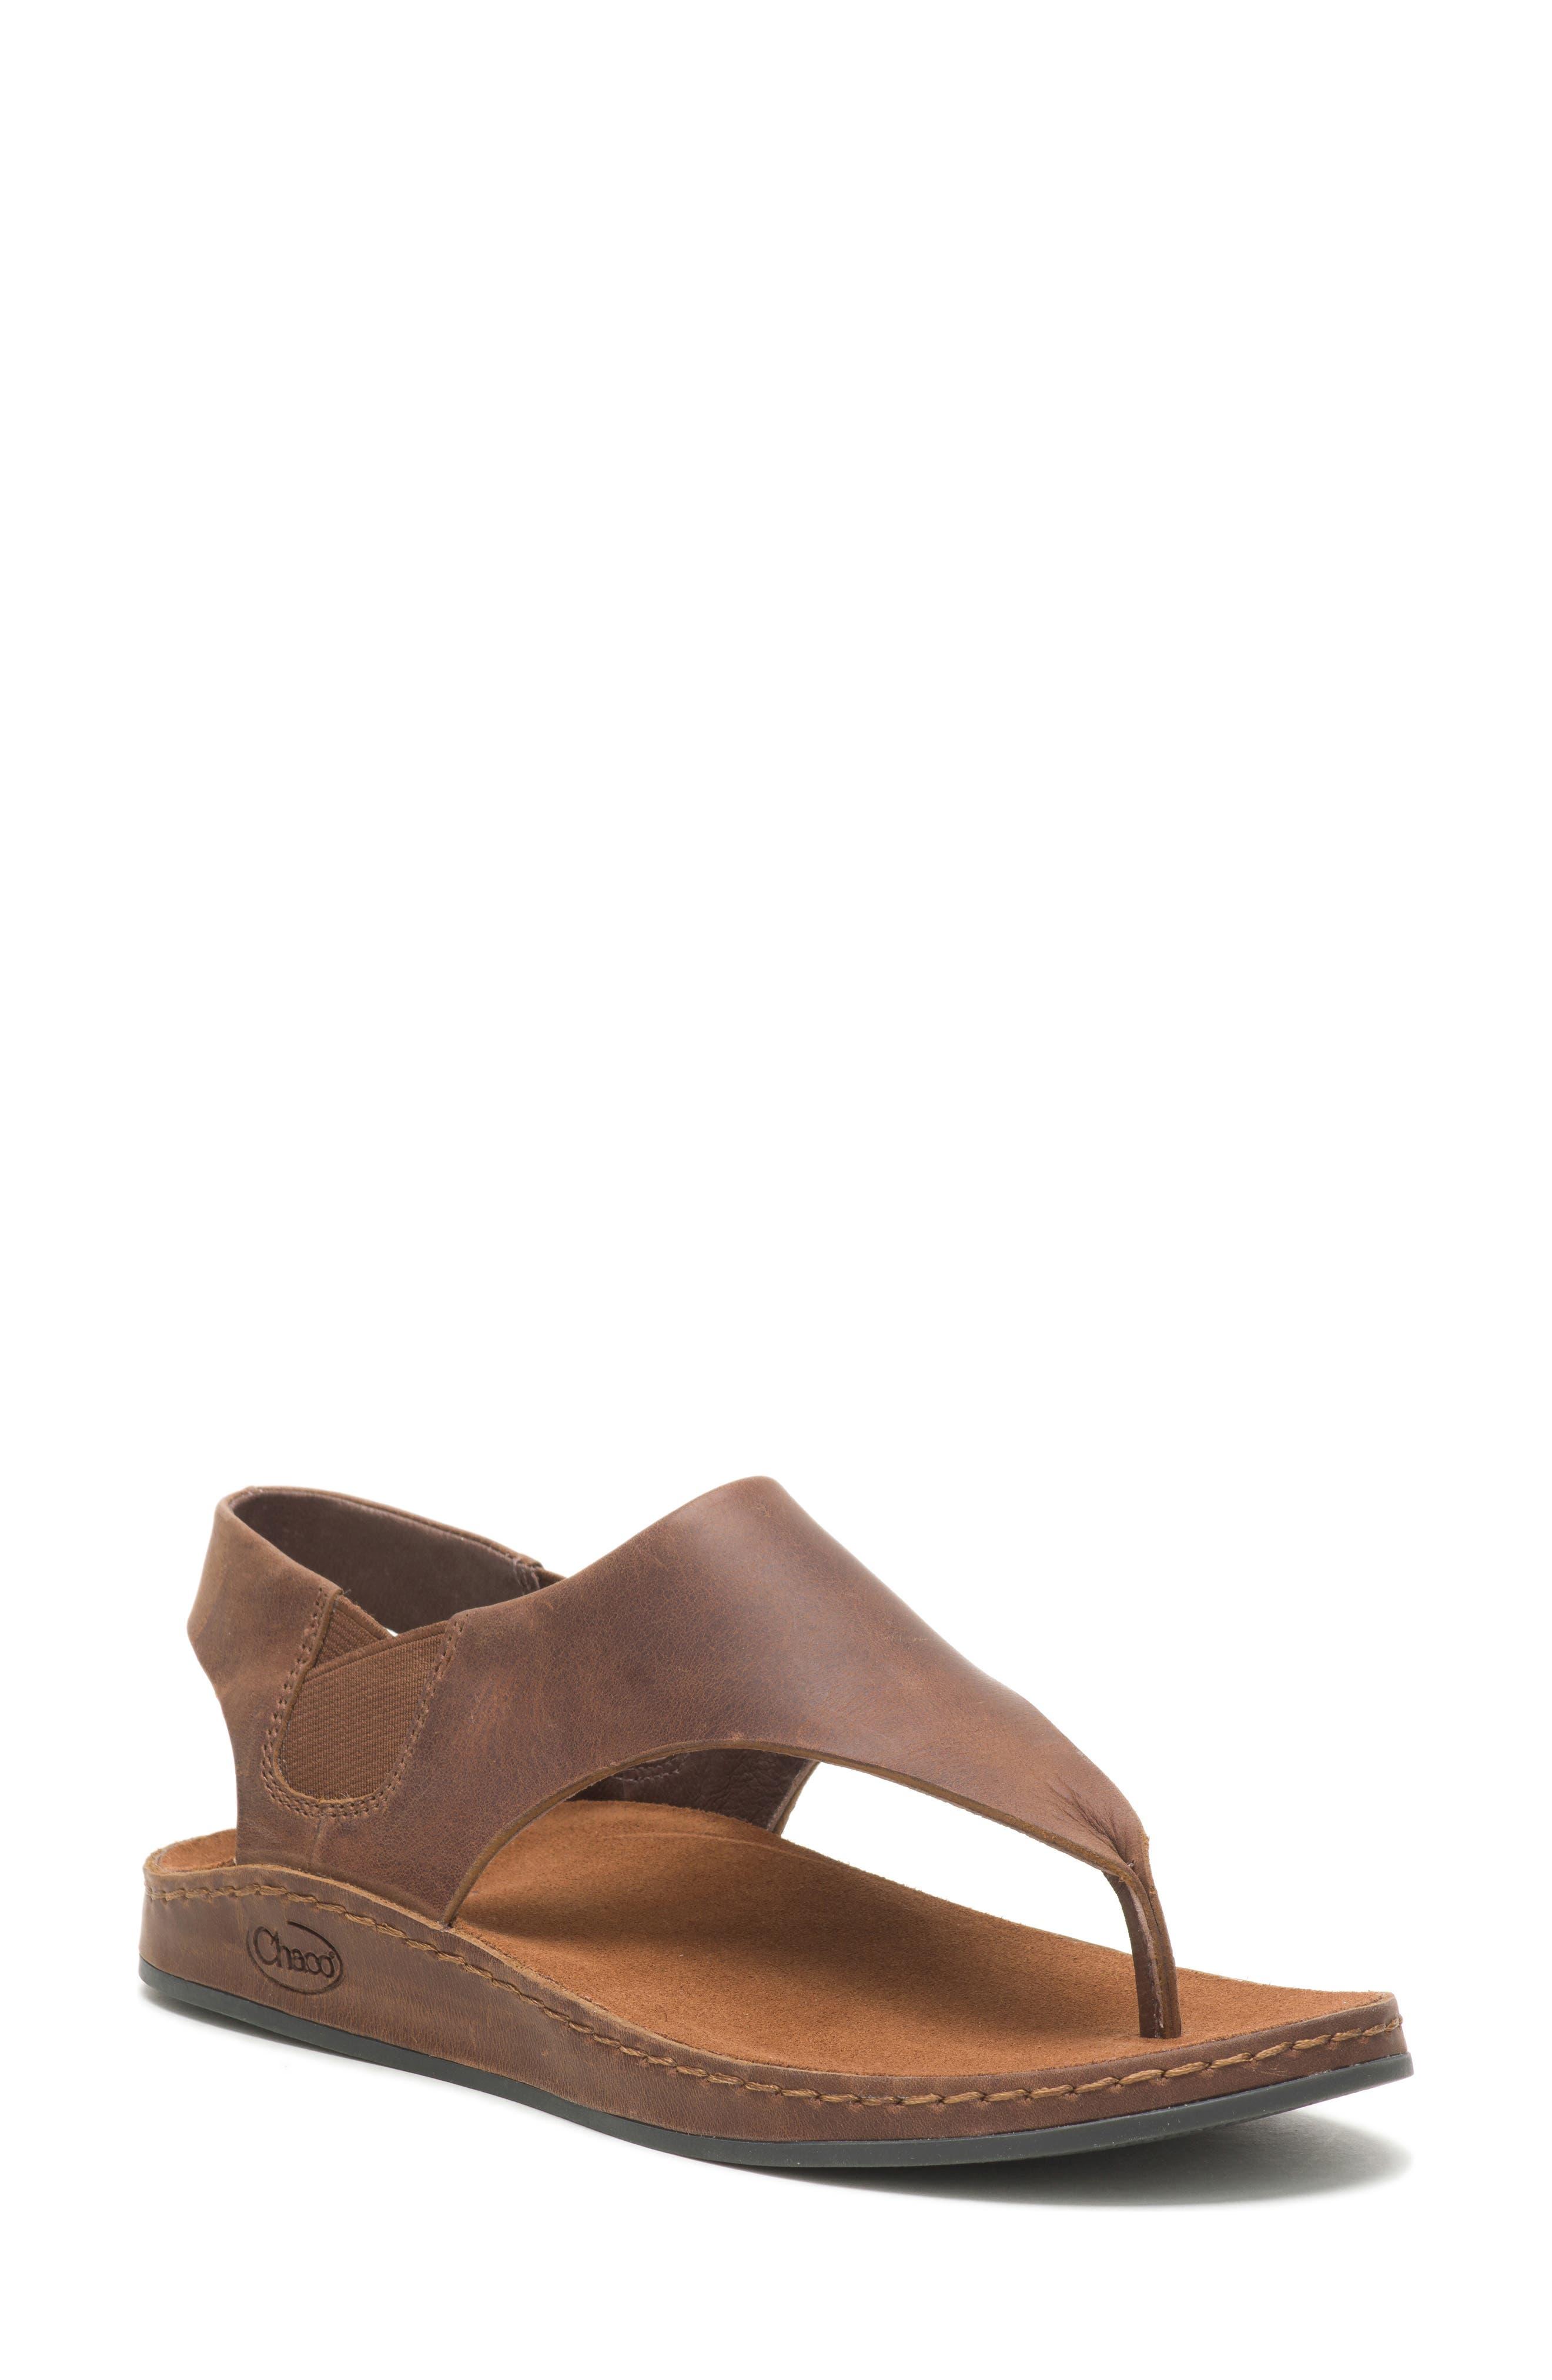 Wayfarer Slingback Sandal